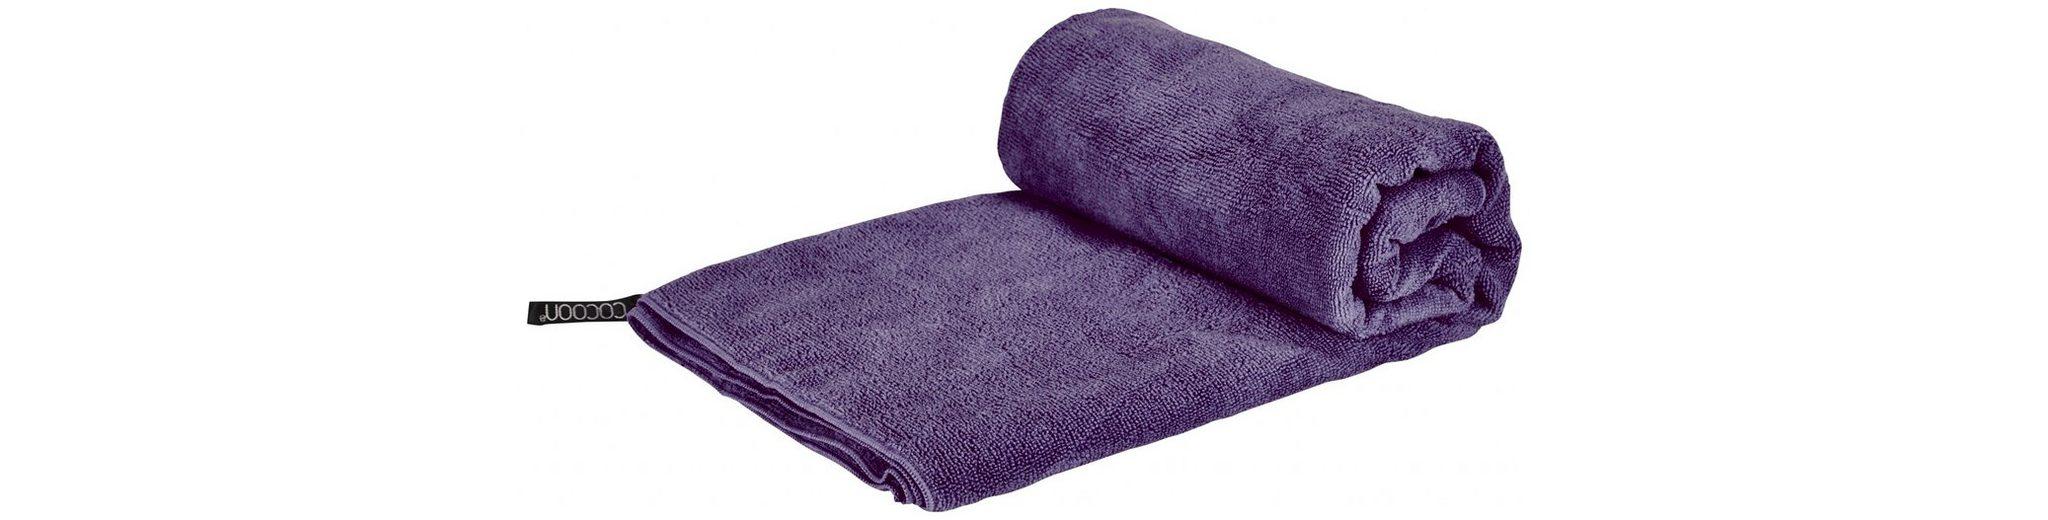 Cocoon Reisehandtuch »Microfiber Terry Towel Medium«